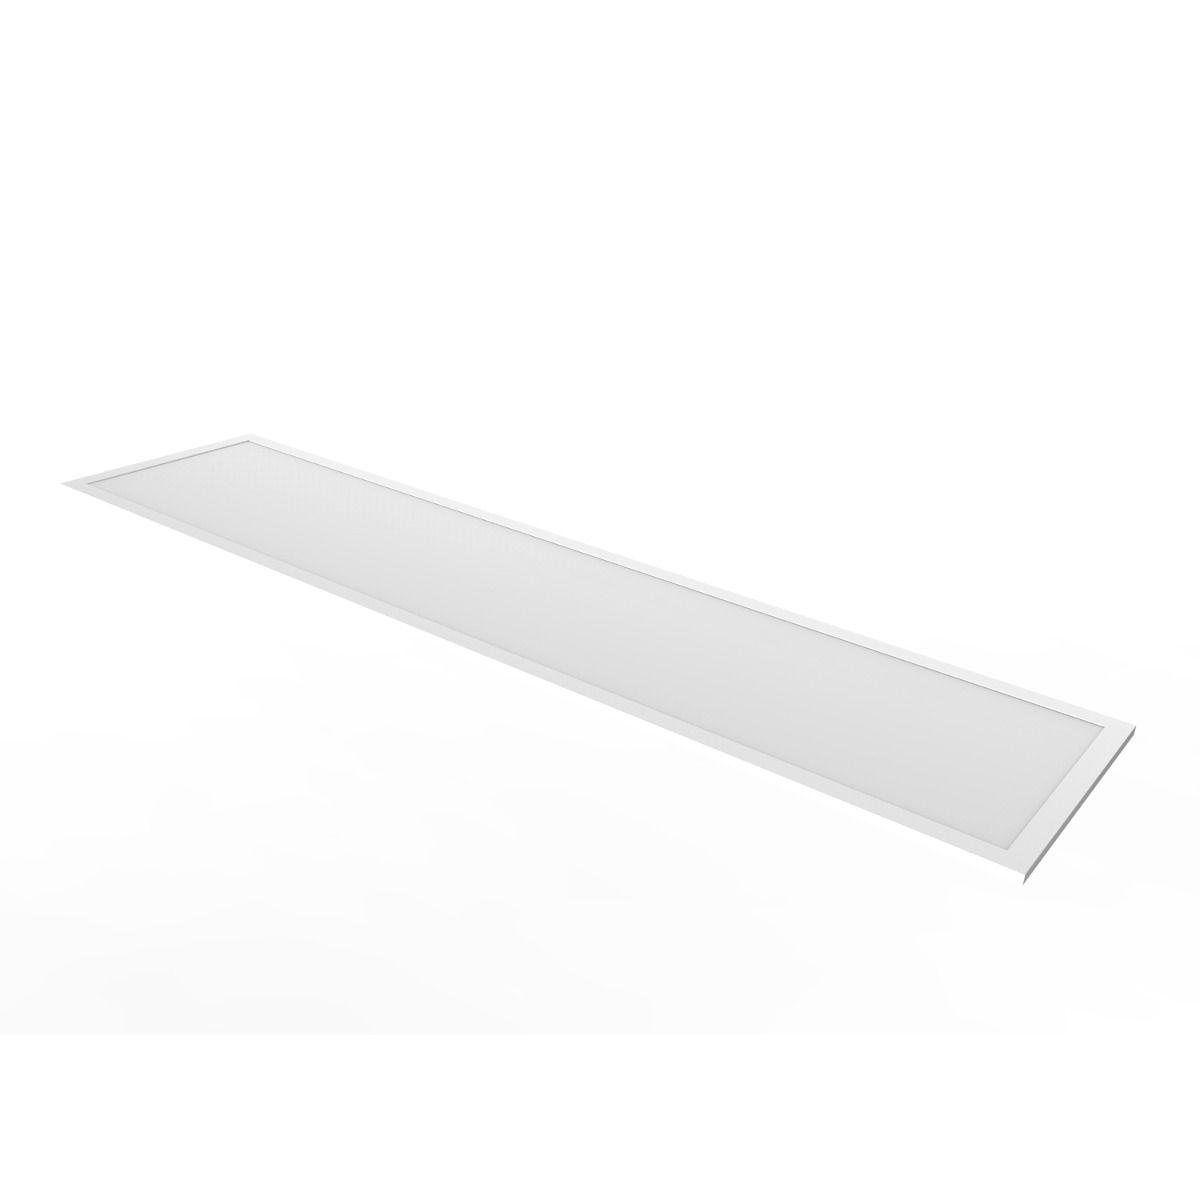 Noxion LED Panel Ecowhite V2.0 30x120cm 3000K 36W UGR <19 | Warm White - Replaces 2x36W